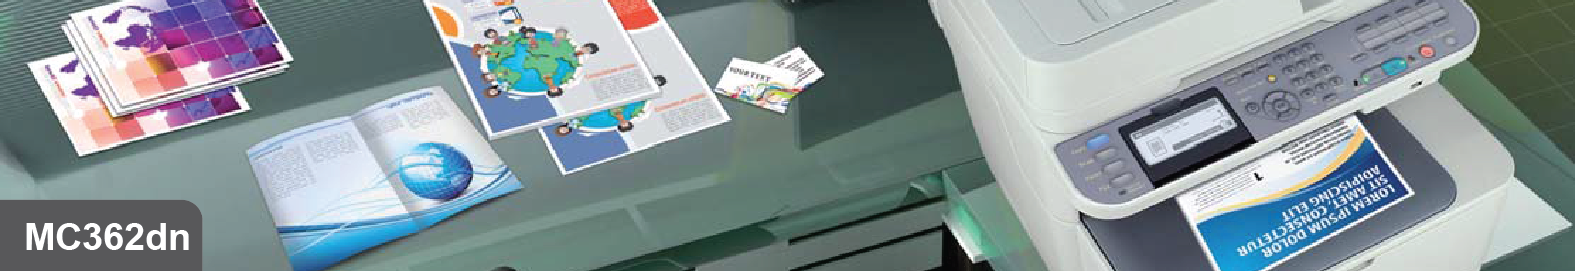 Máy in đa năng OKI MC362dn, tương đương máy Photocopy màu cao cấp.